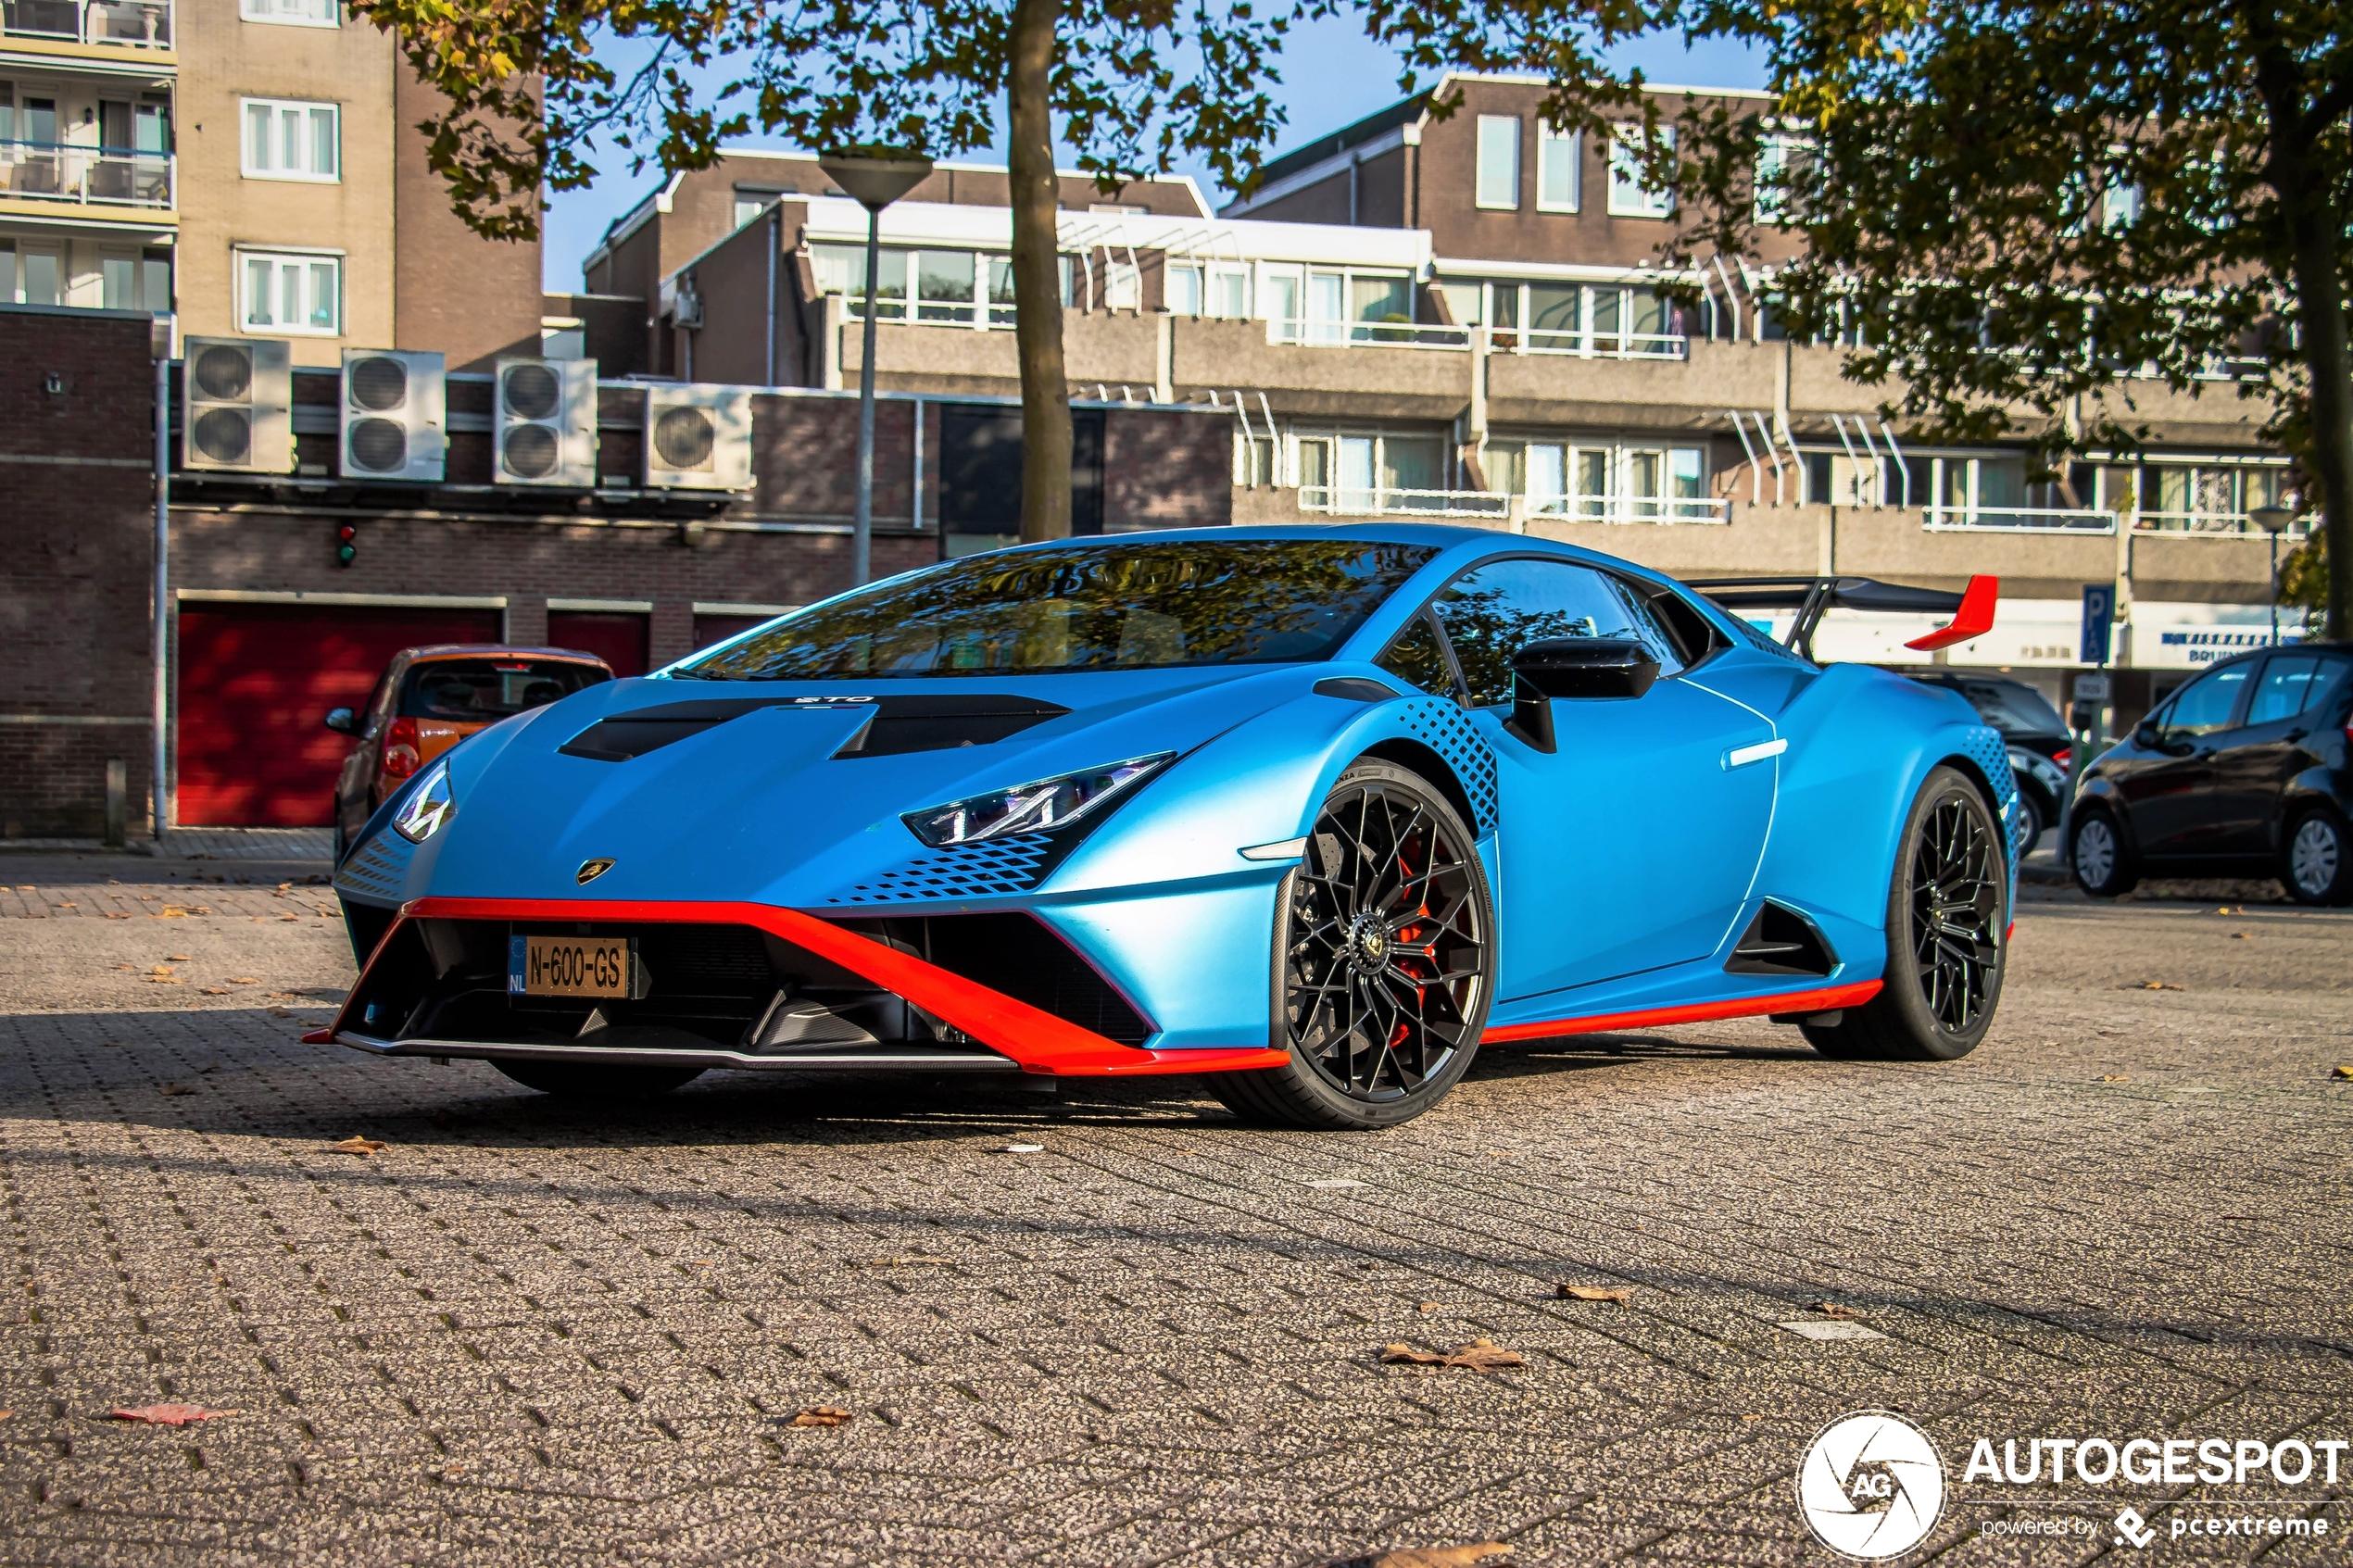 Lekker heftig: nieuwe Lamborghini Huracán LP640-2 STO in Nederland